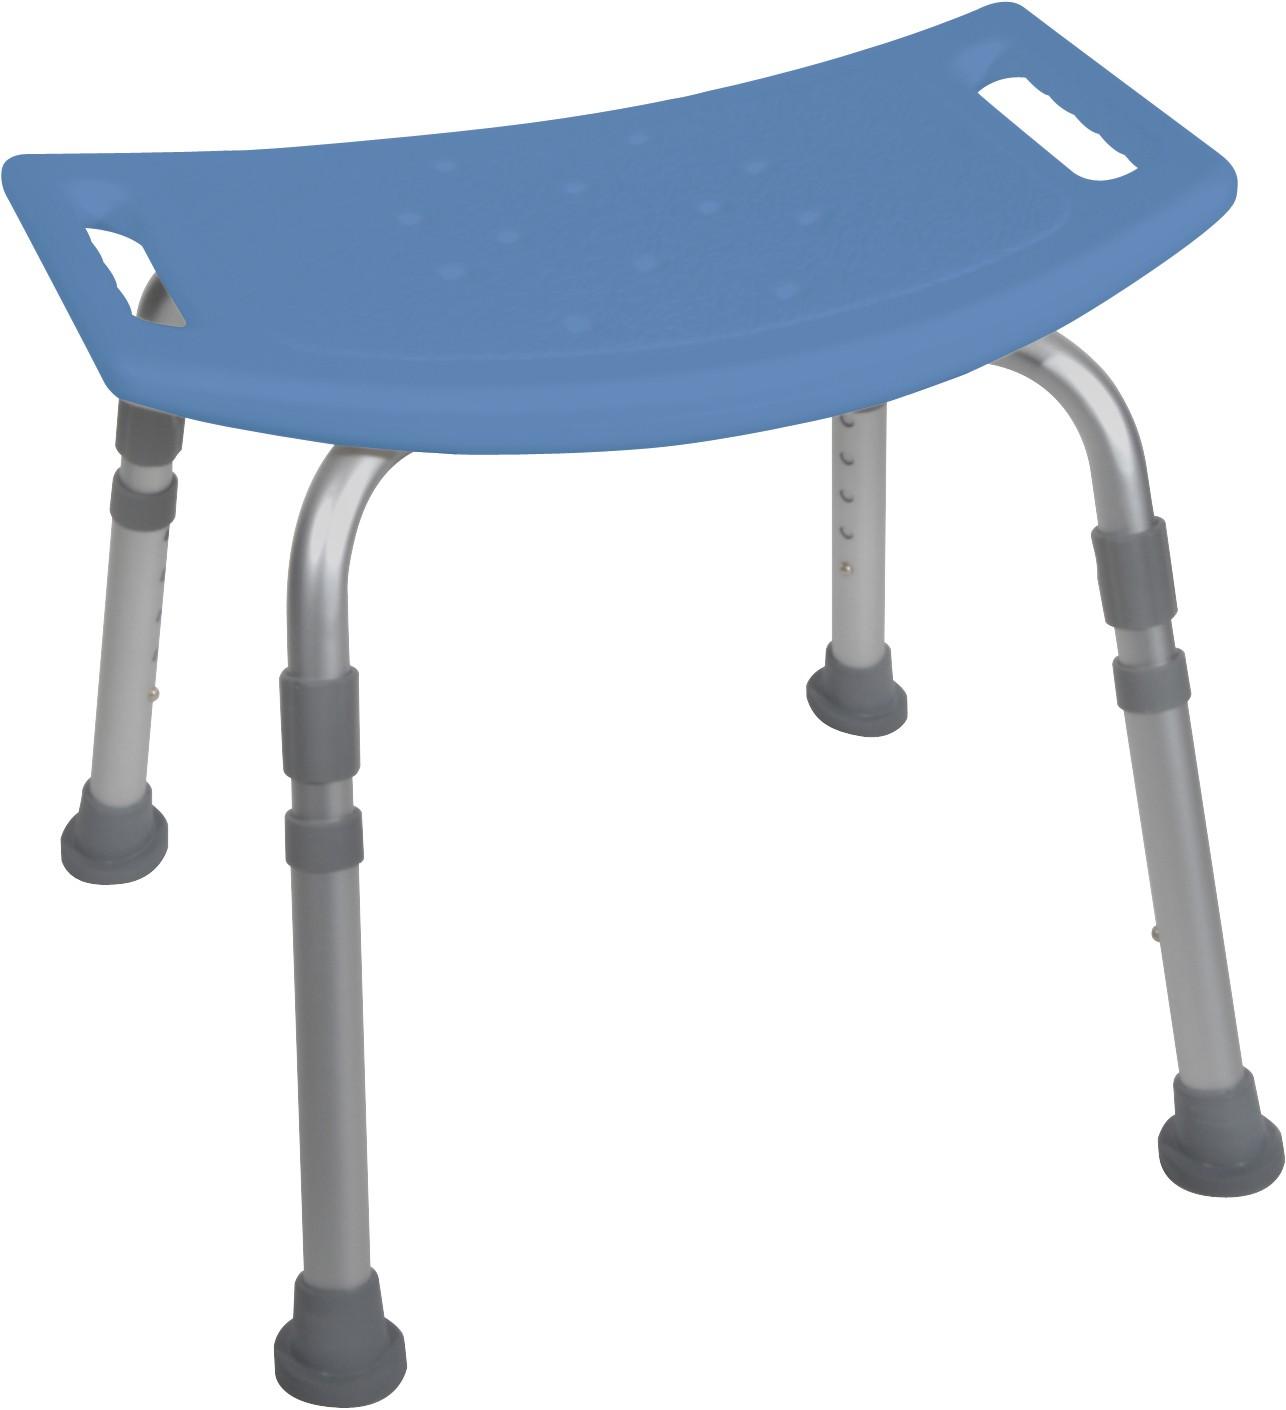 bathroom_safety_bench_chair2.jpg